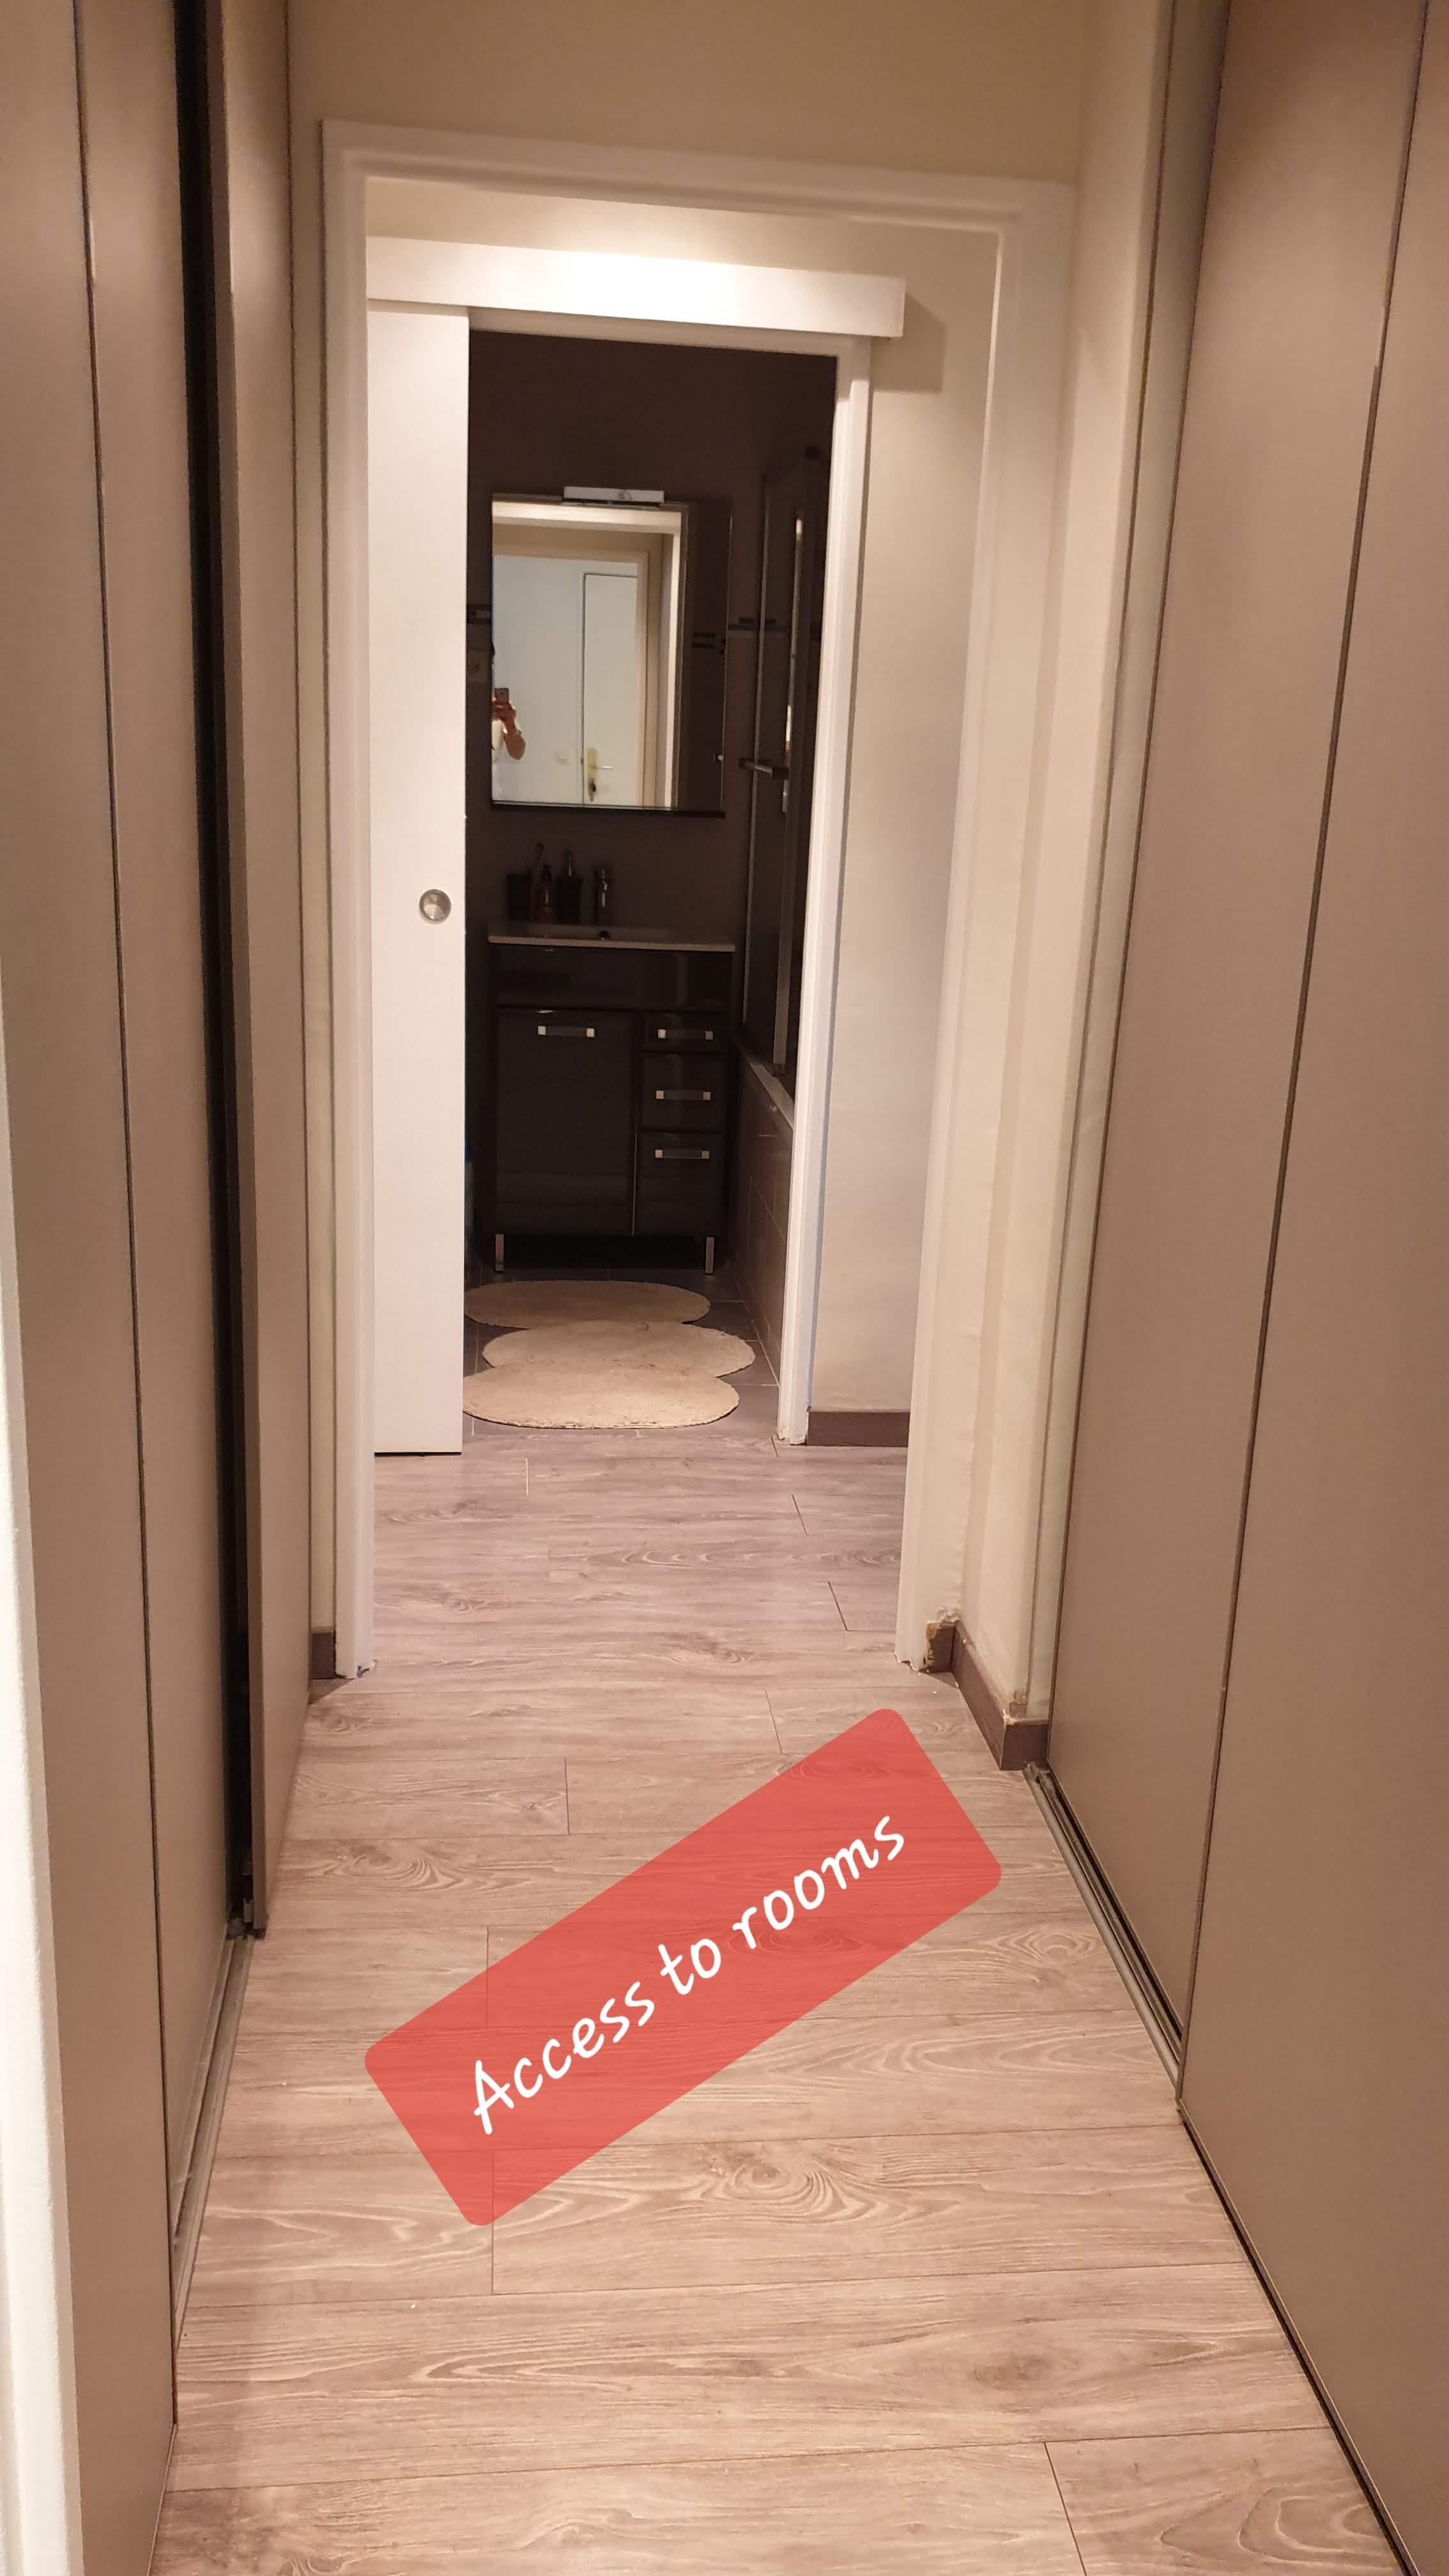 Rue Francis Carton, Cormeilles-en-Parisis, France